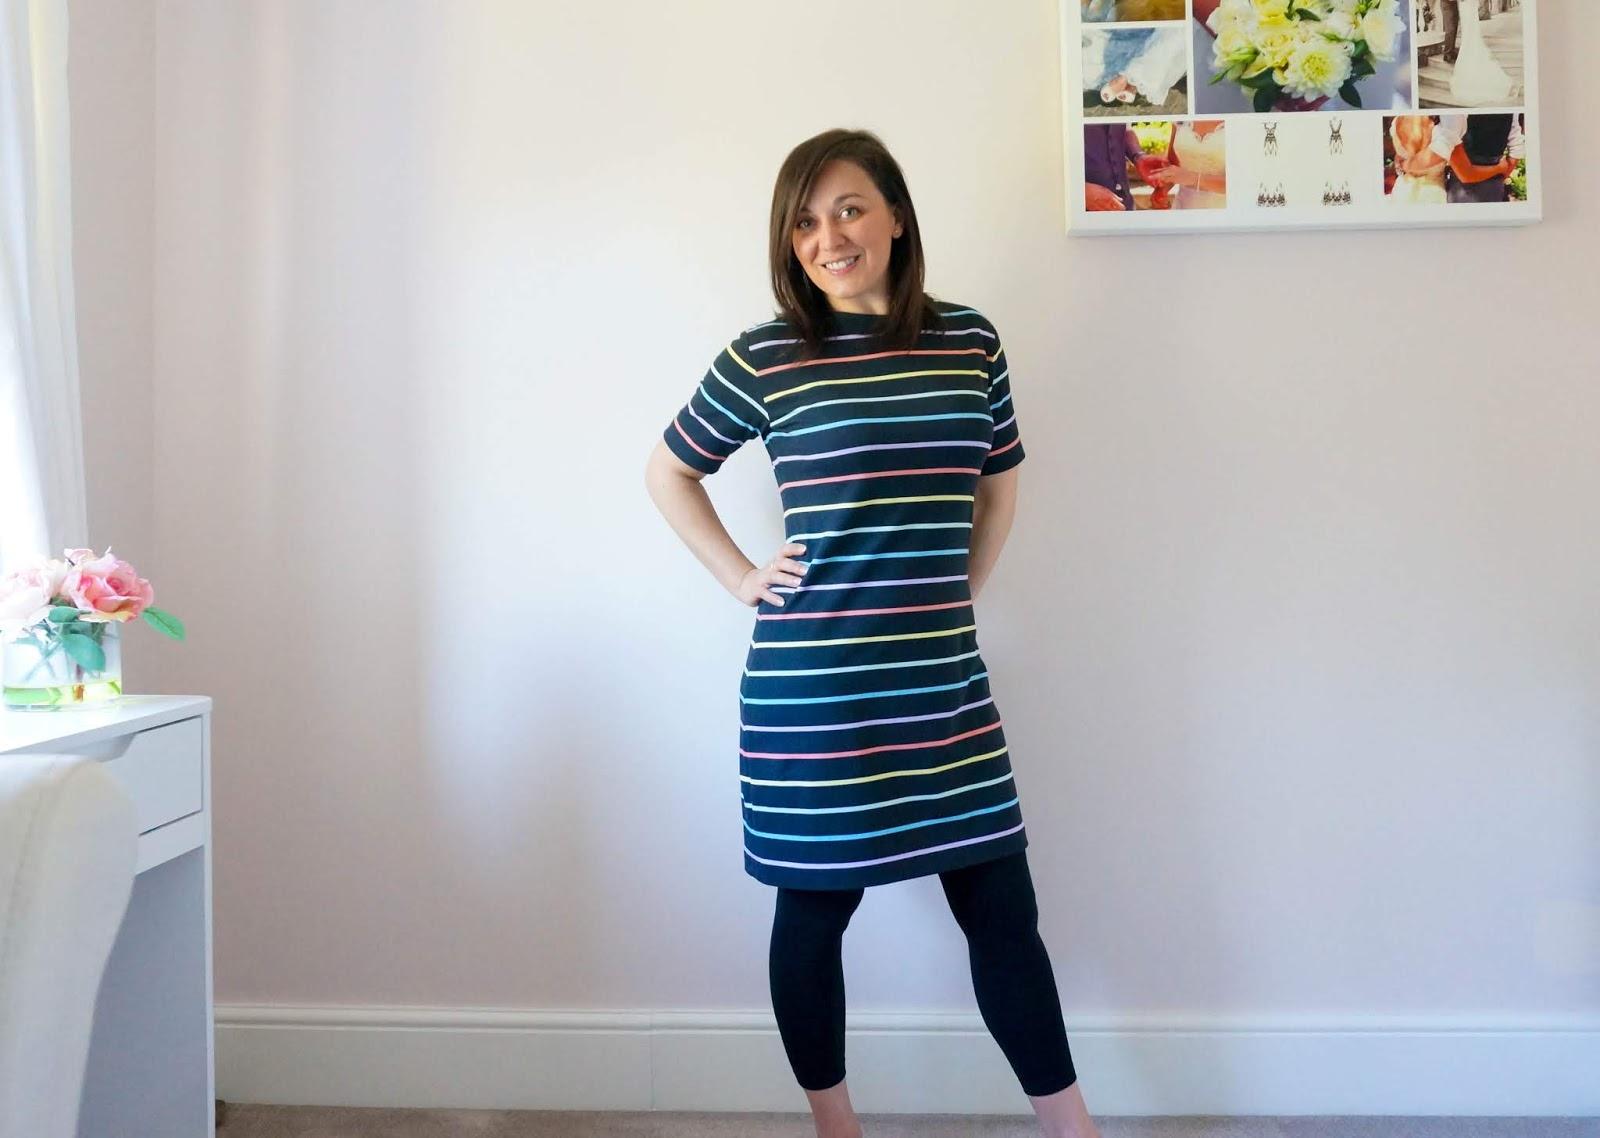 Rainbow T-Shirt dress using Sew Over It Molly dress and Seamwork Astoria patterns